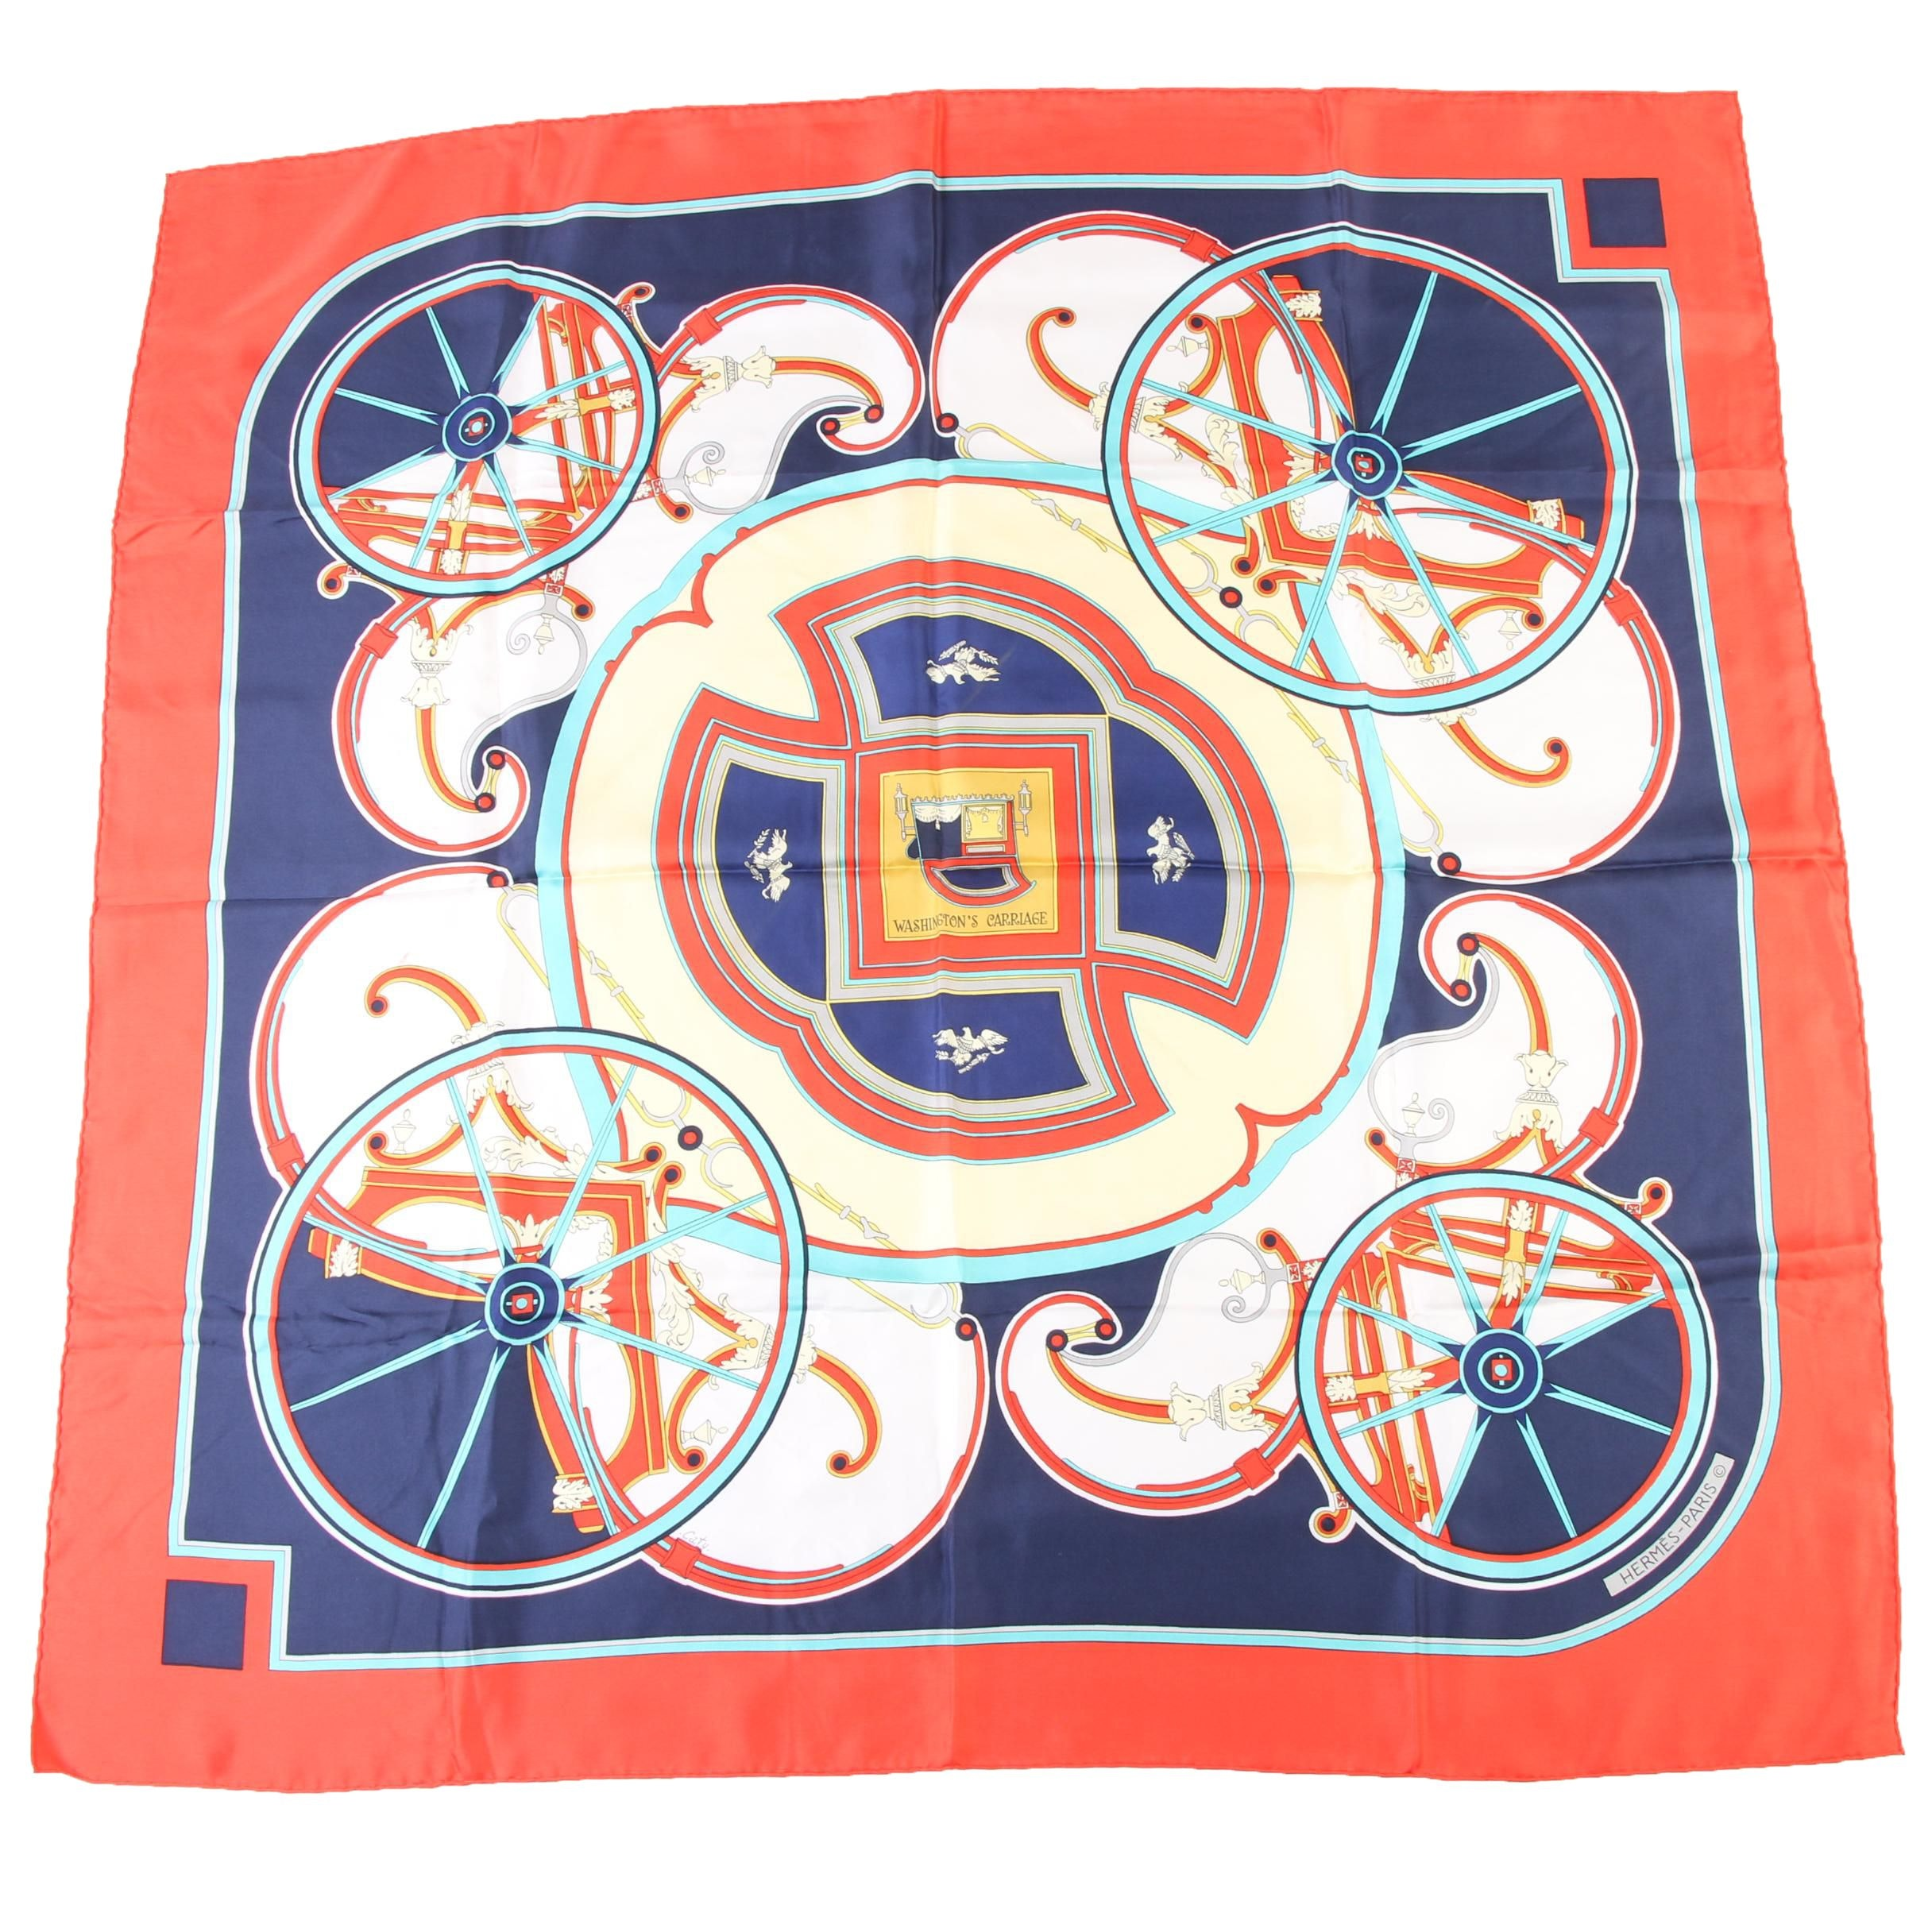 "Hermès Paris ""Washington's Carriage"" Silk Scarf Designed by Caty Latham"